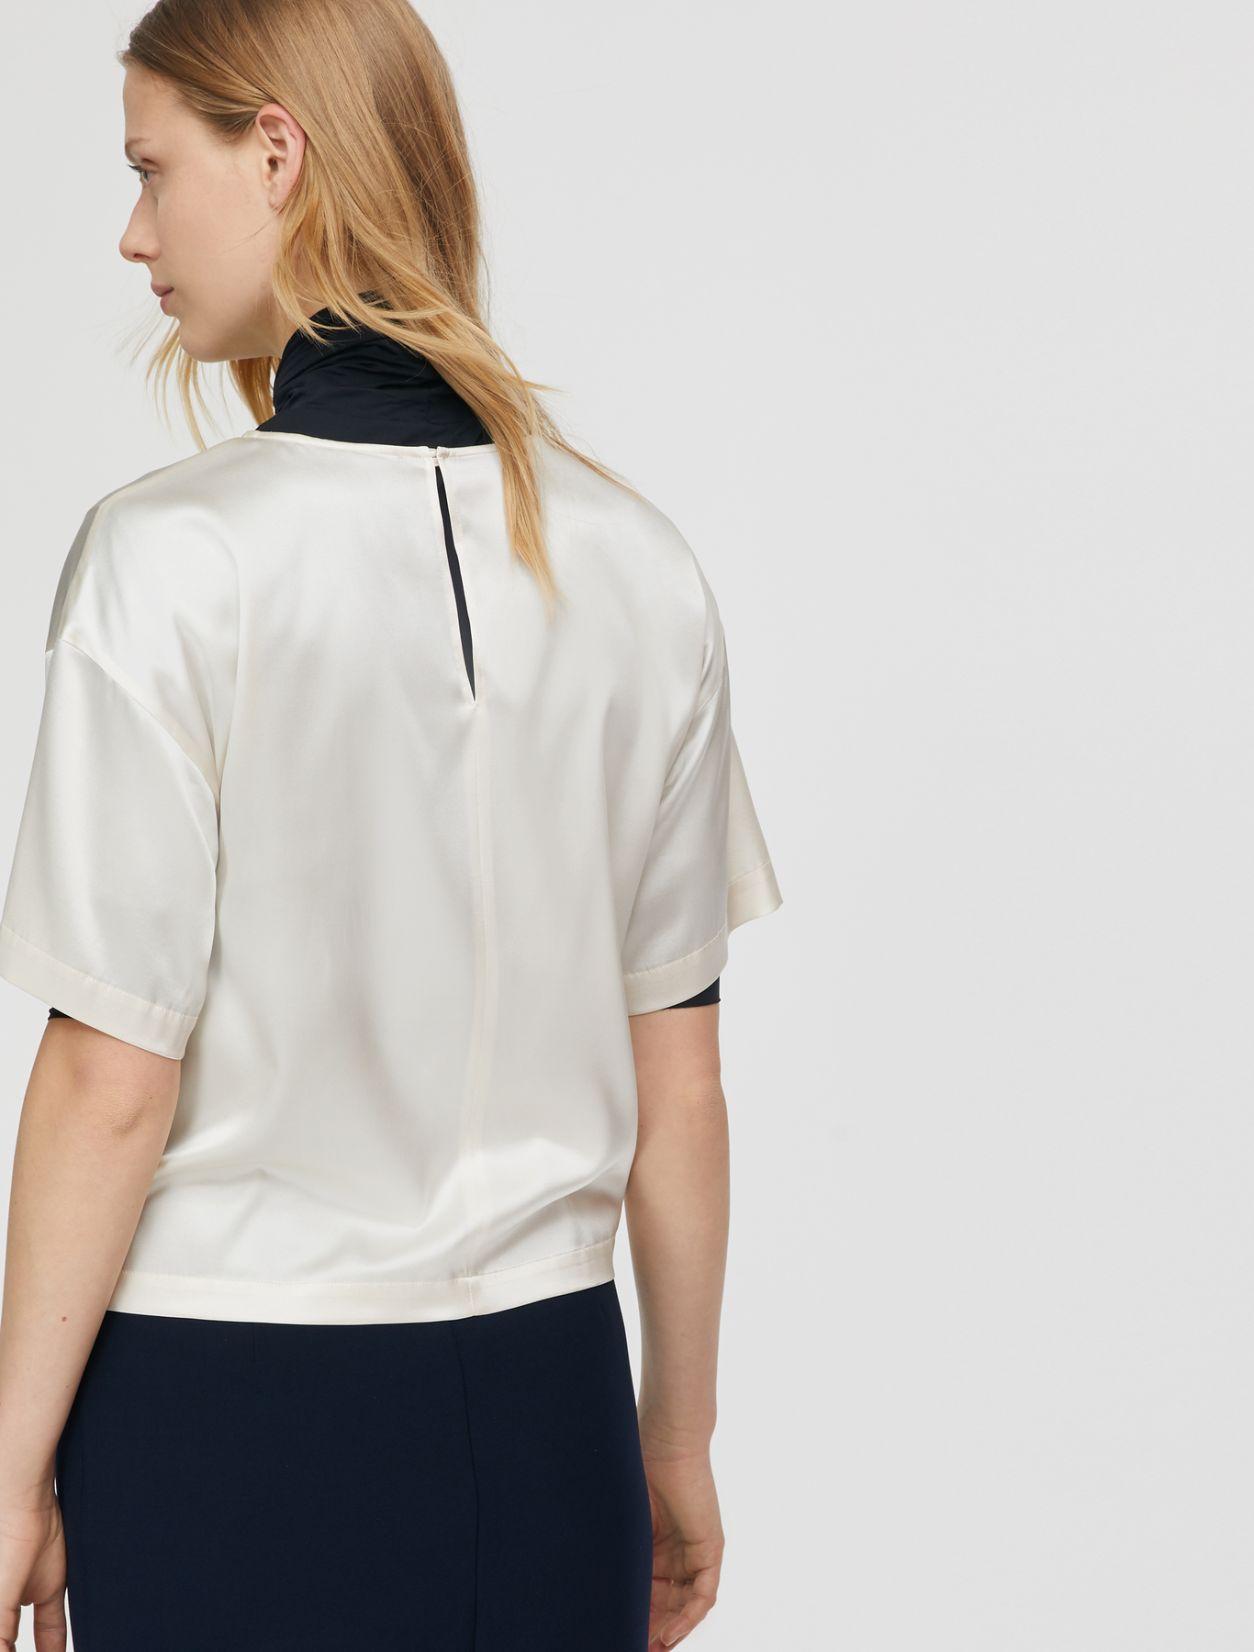 DENTISTA Shirt ivory 2